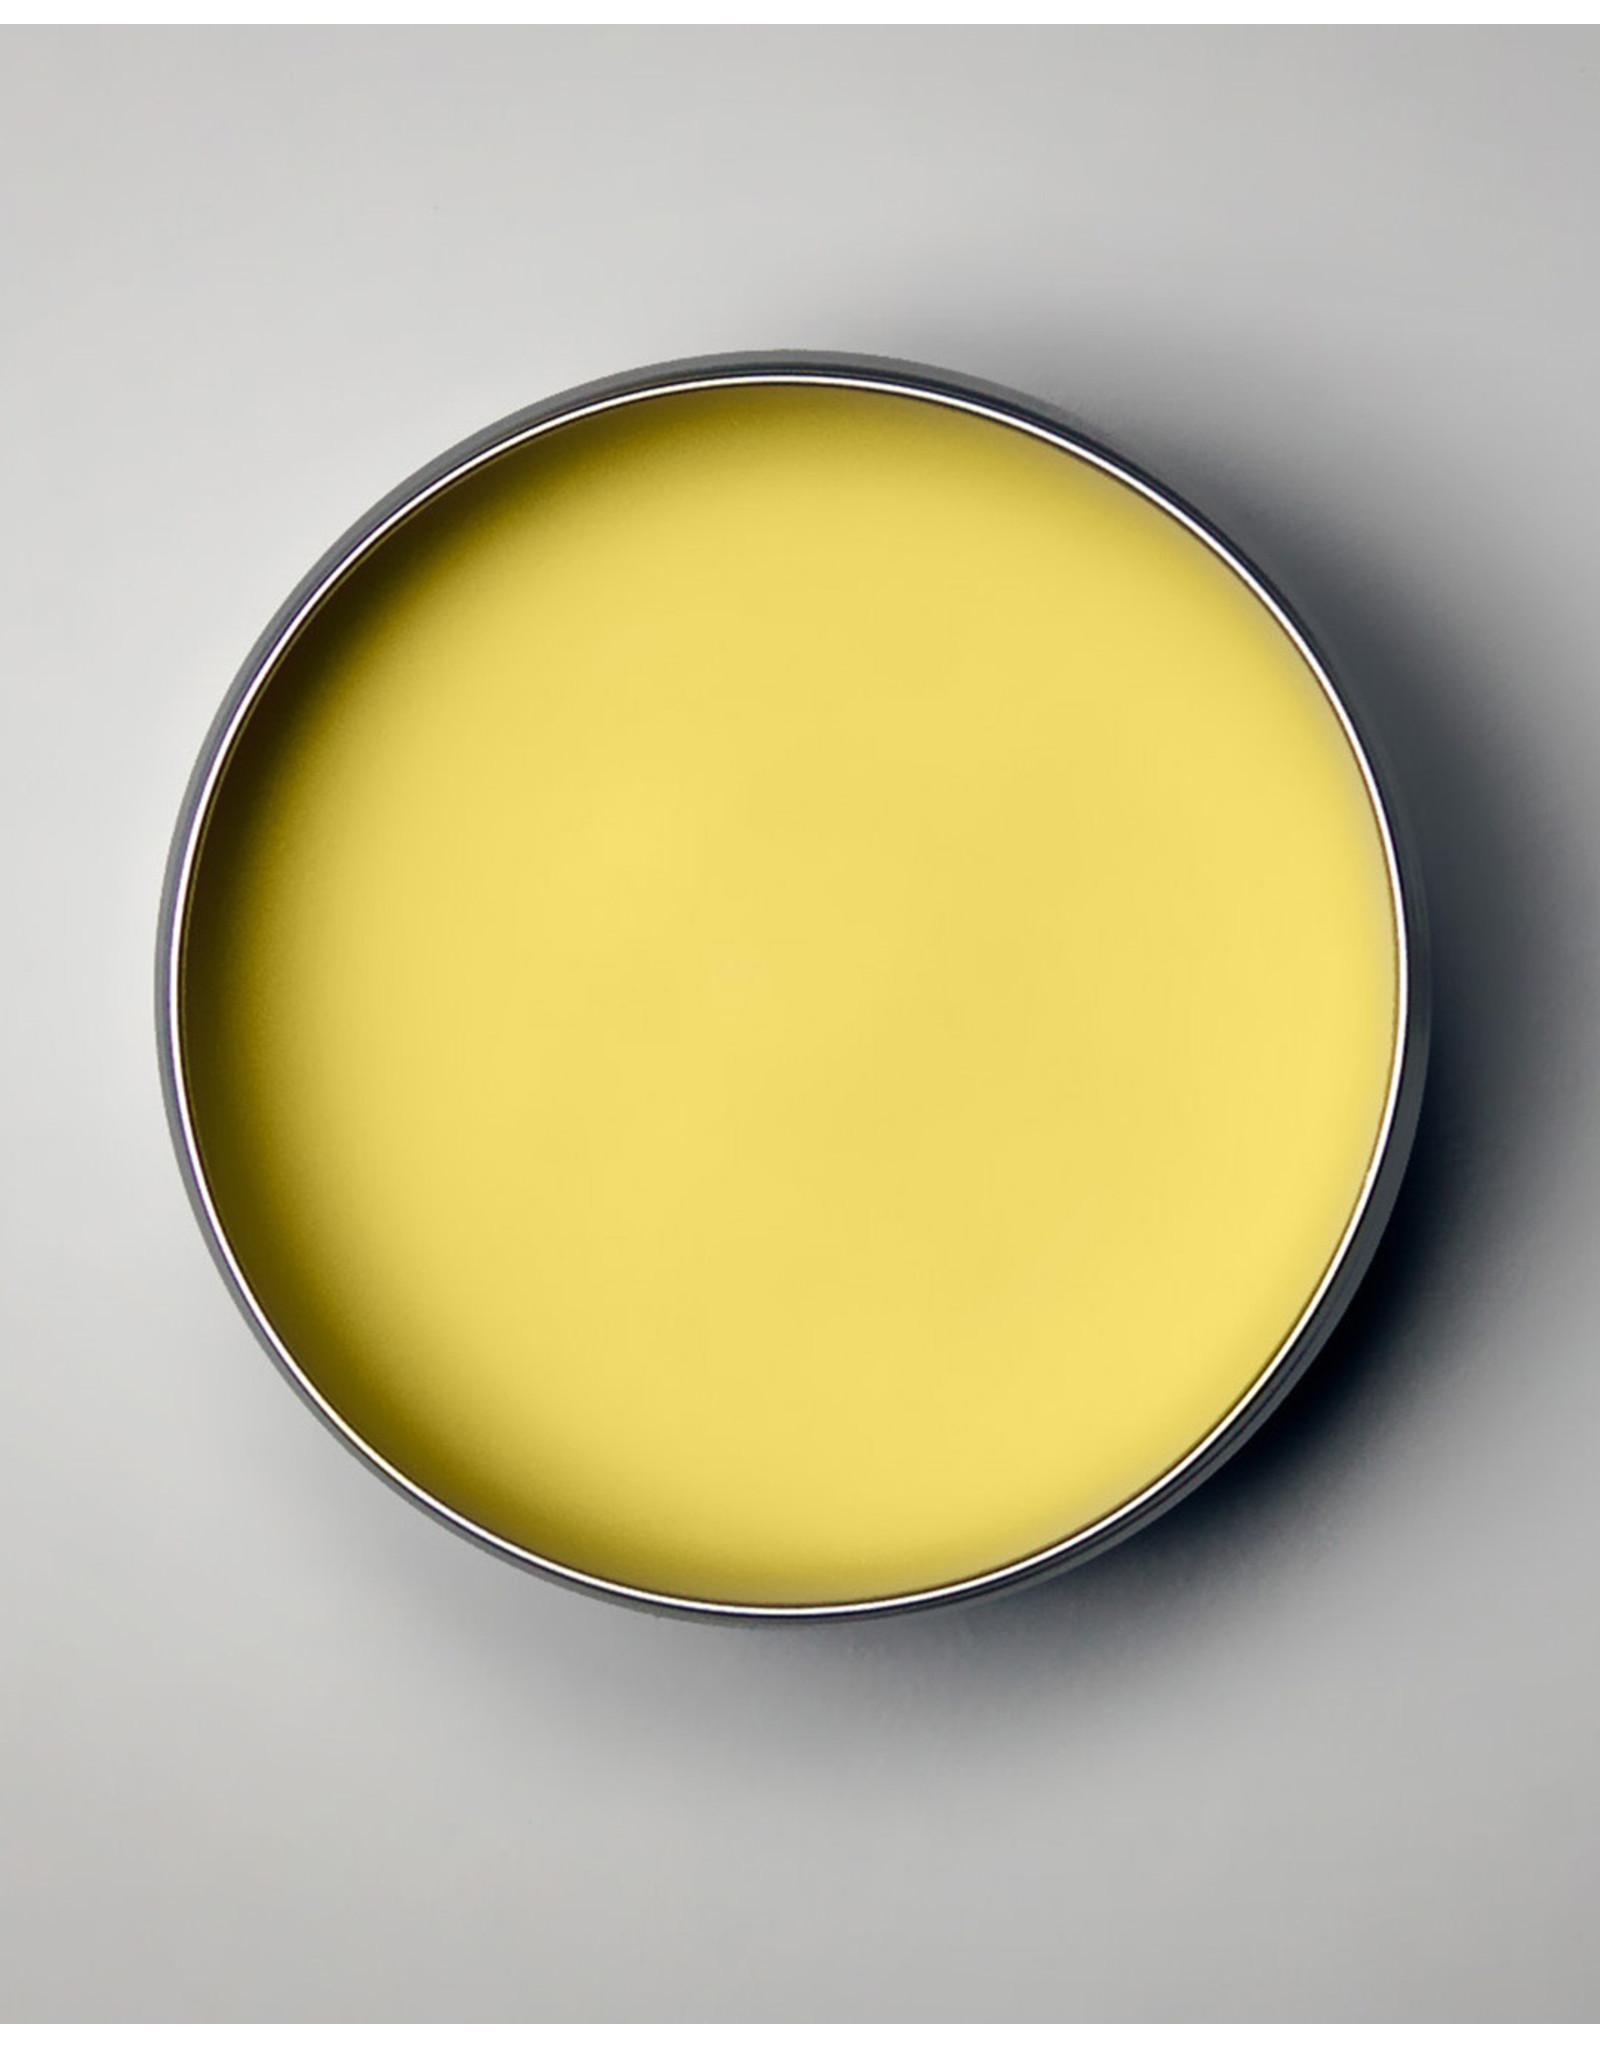 Lovebee Make it Better Balm by Lovebee Products